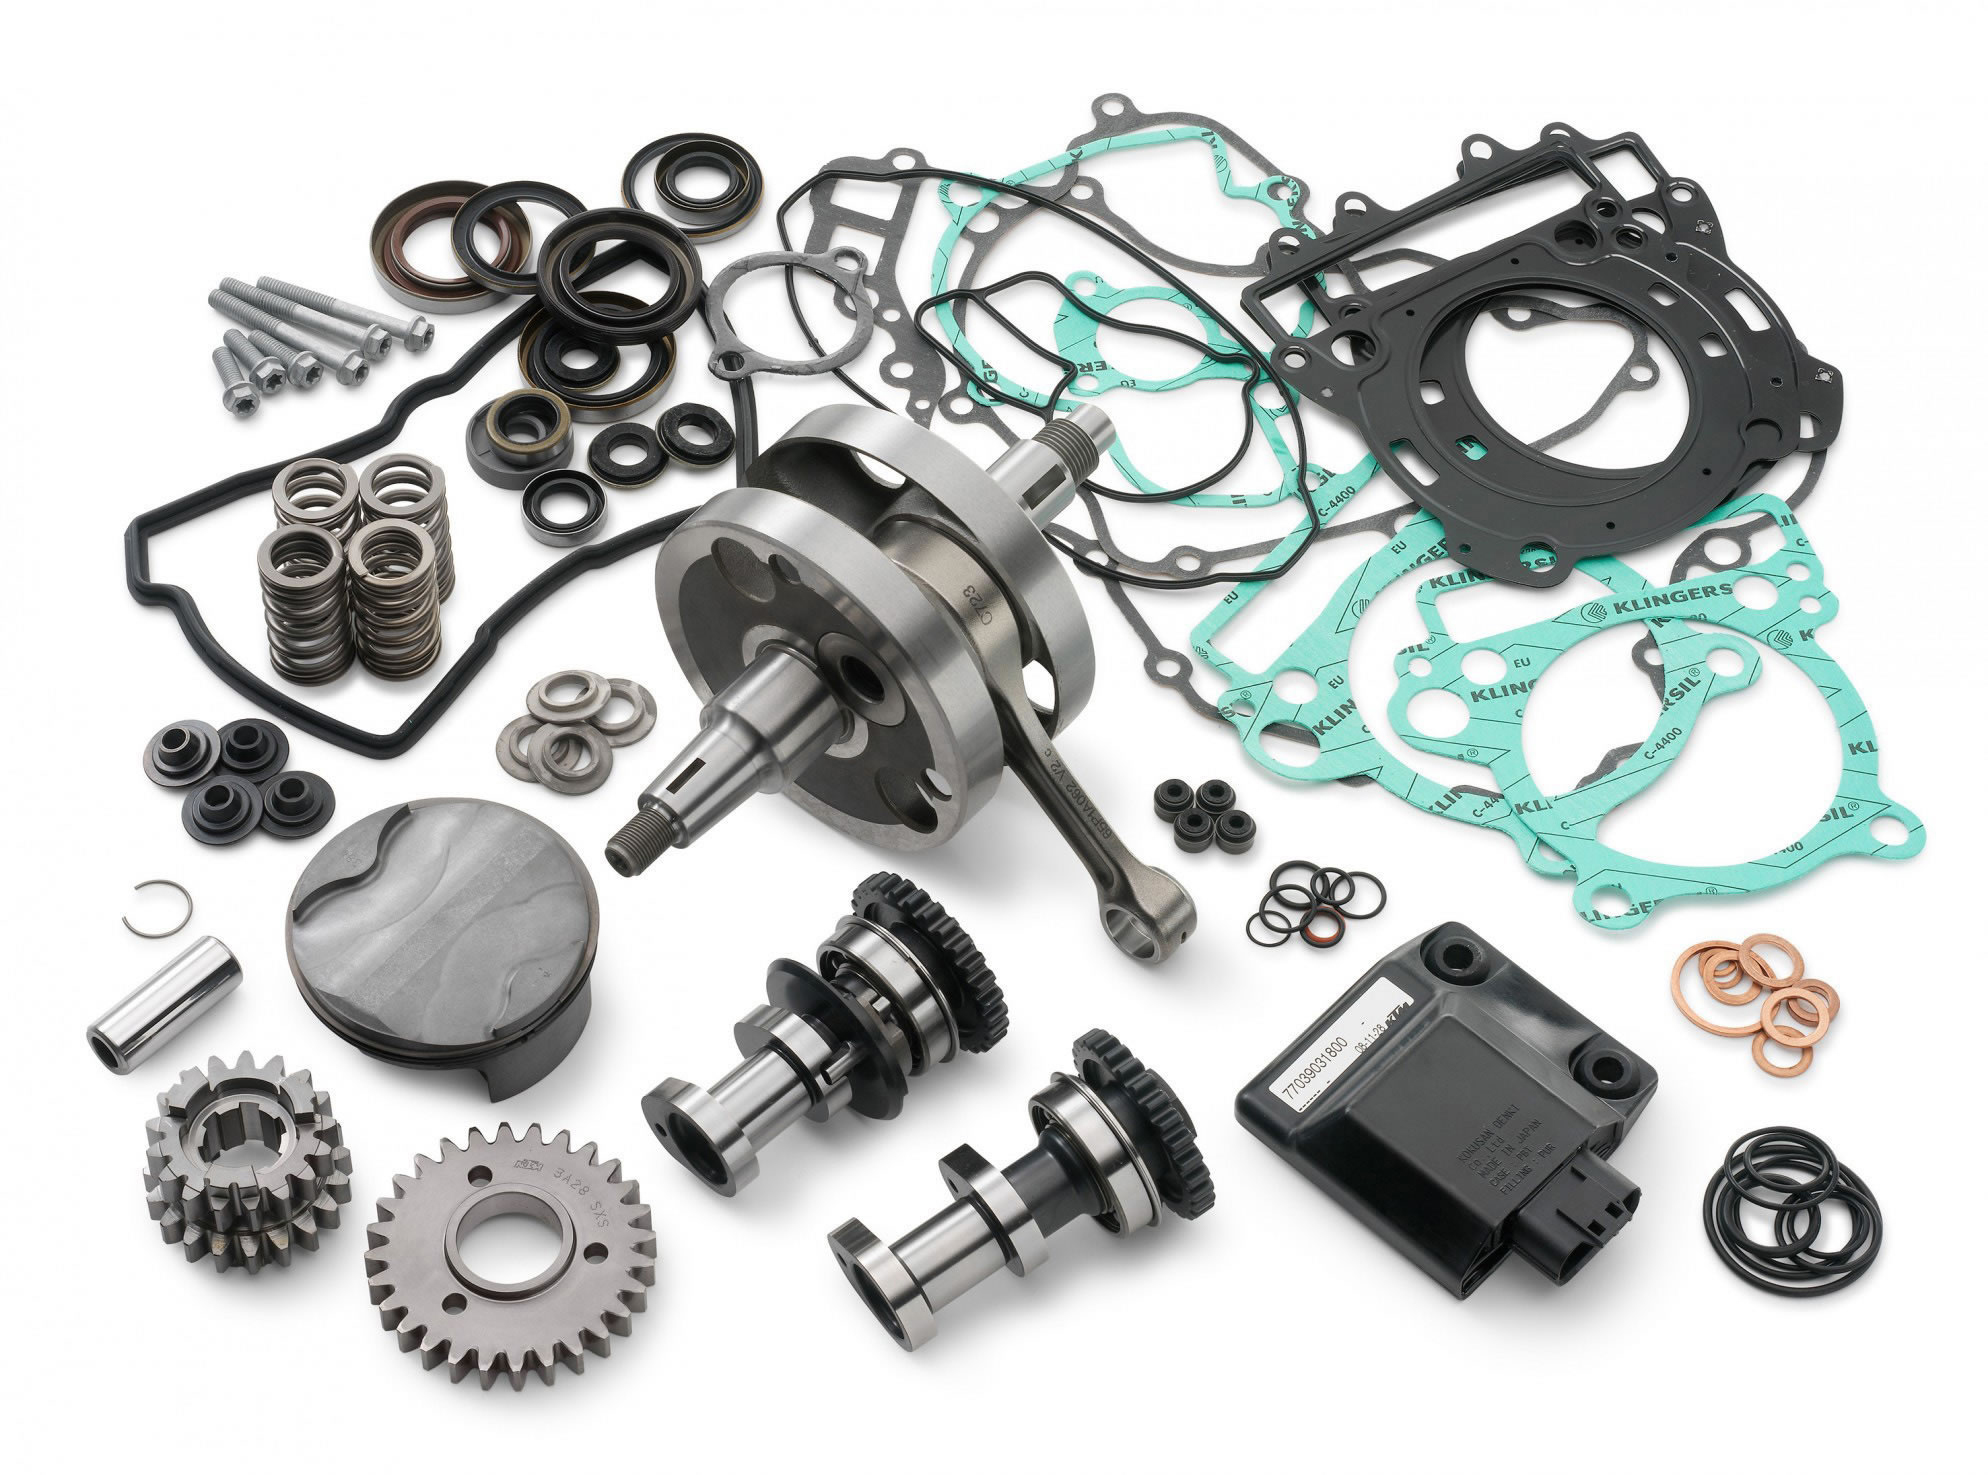 Ktm Parts Ktm Sxs Factory Tuning Kit 250 Sx F